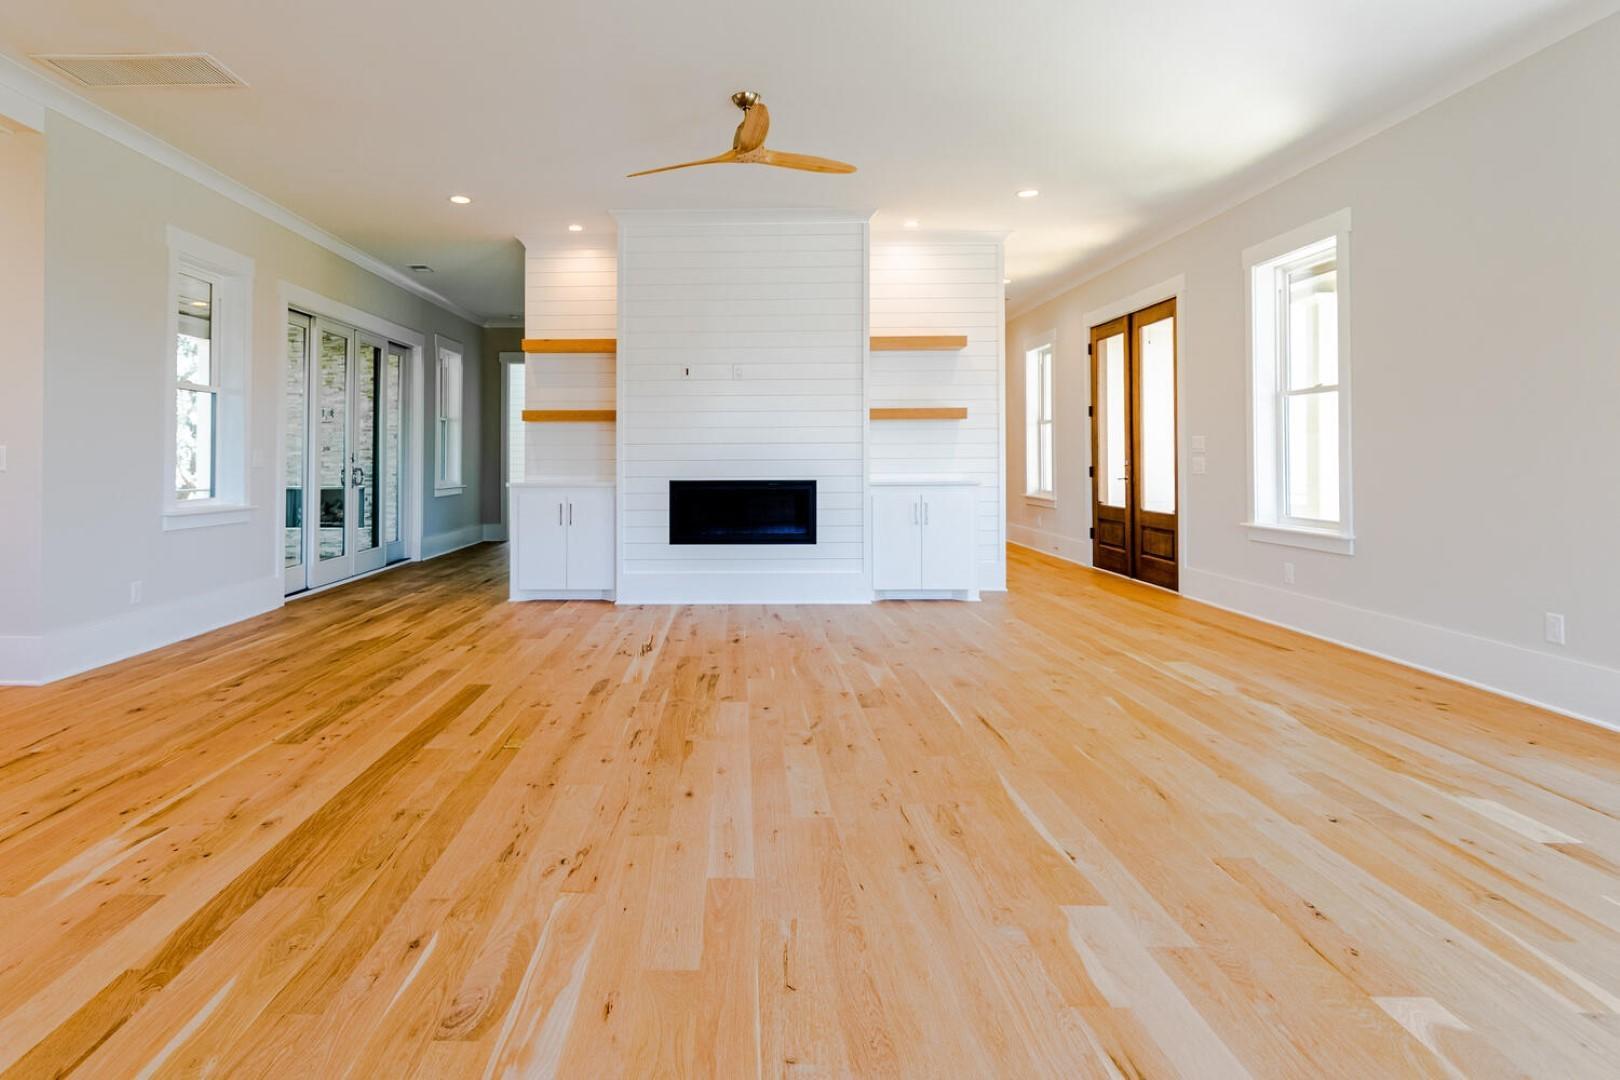 Scanlonville Homes For Sale - 156 5th, Mount Pleasant, SC - 48